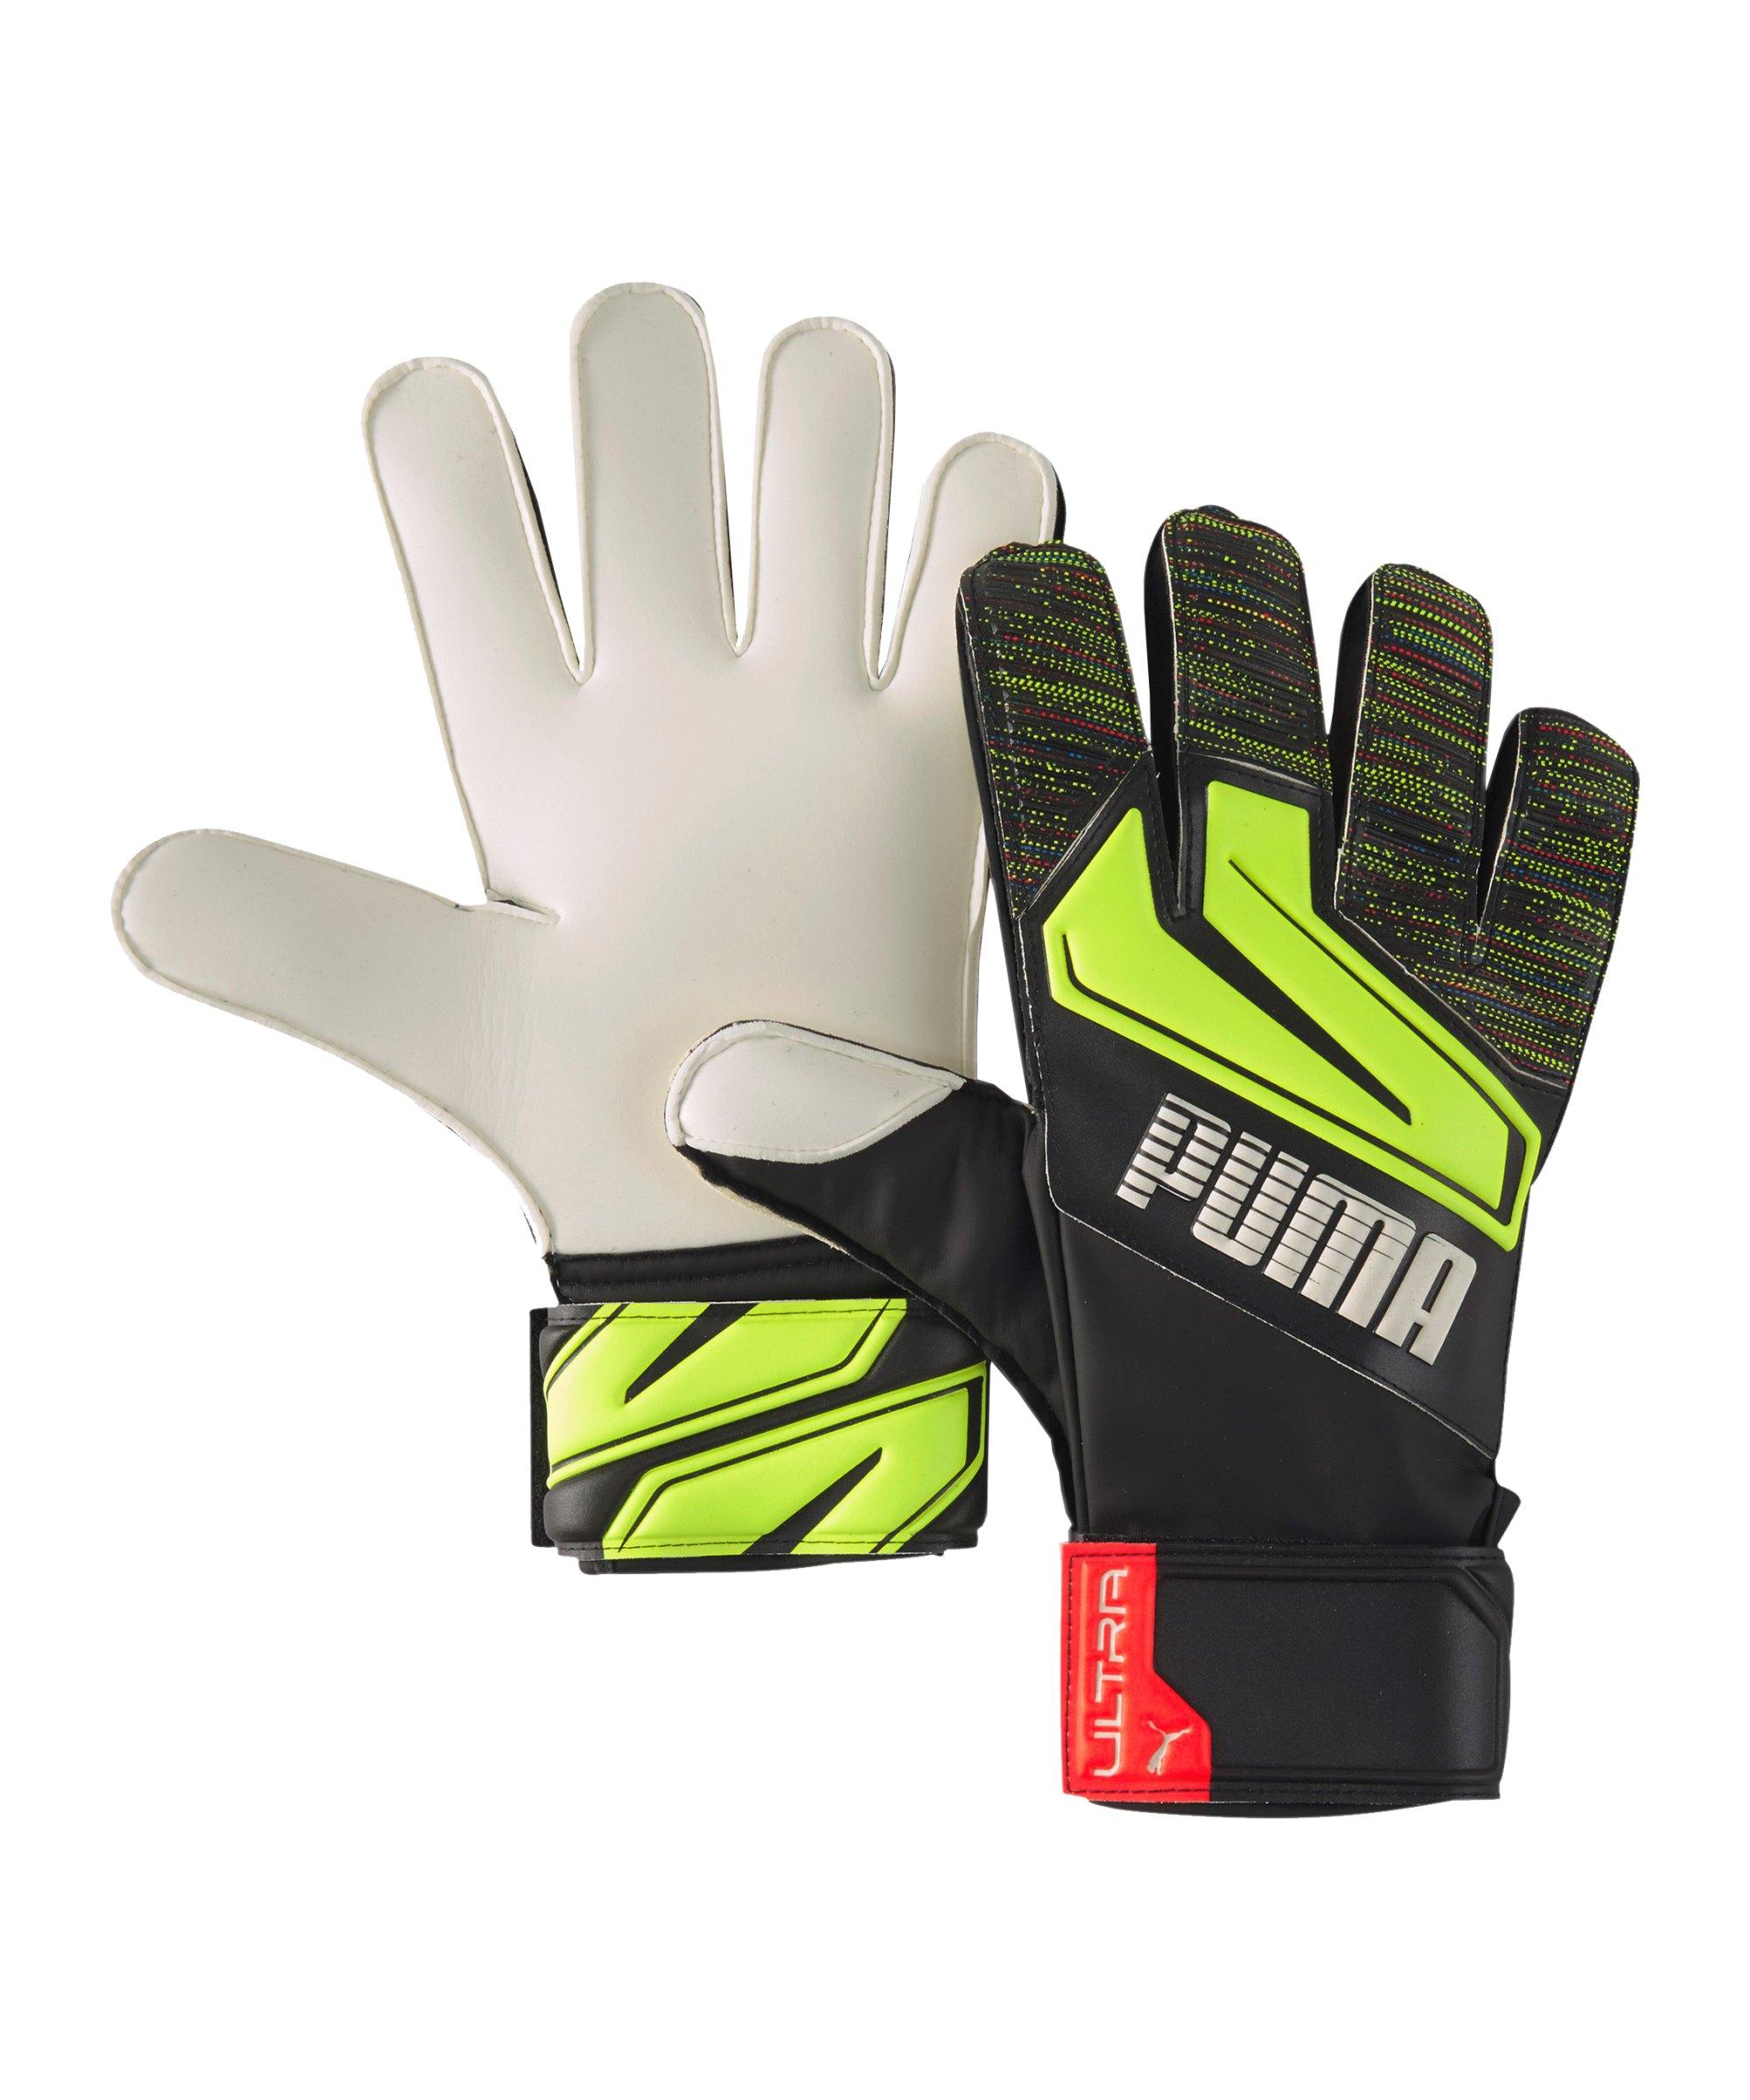 PUMA ULTRA Grip 3 RC TW-Handschuh Schwarz Gelb F08 - schwarz